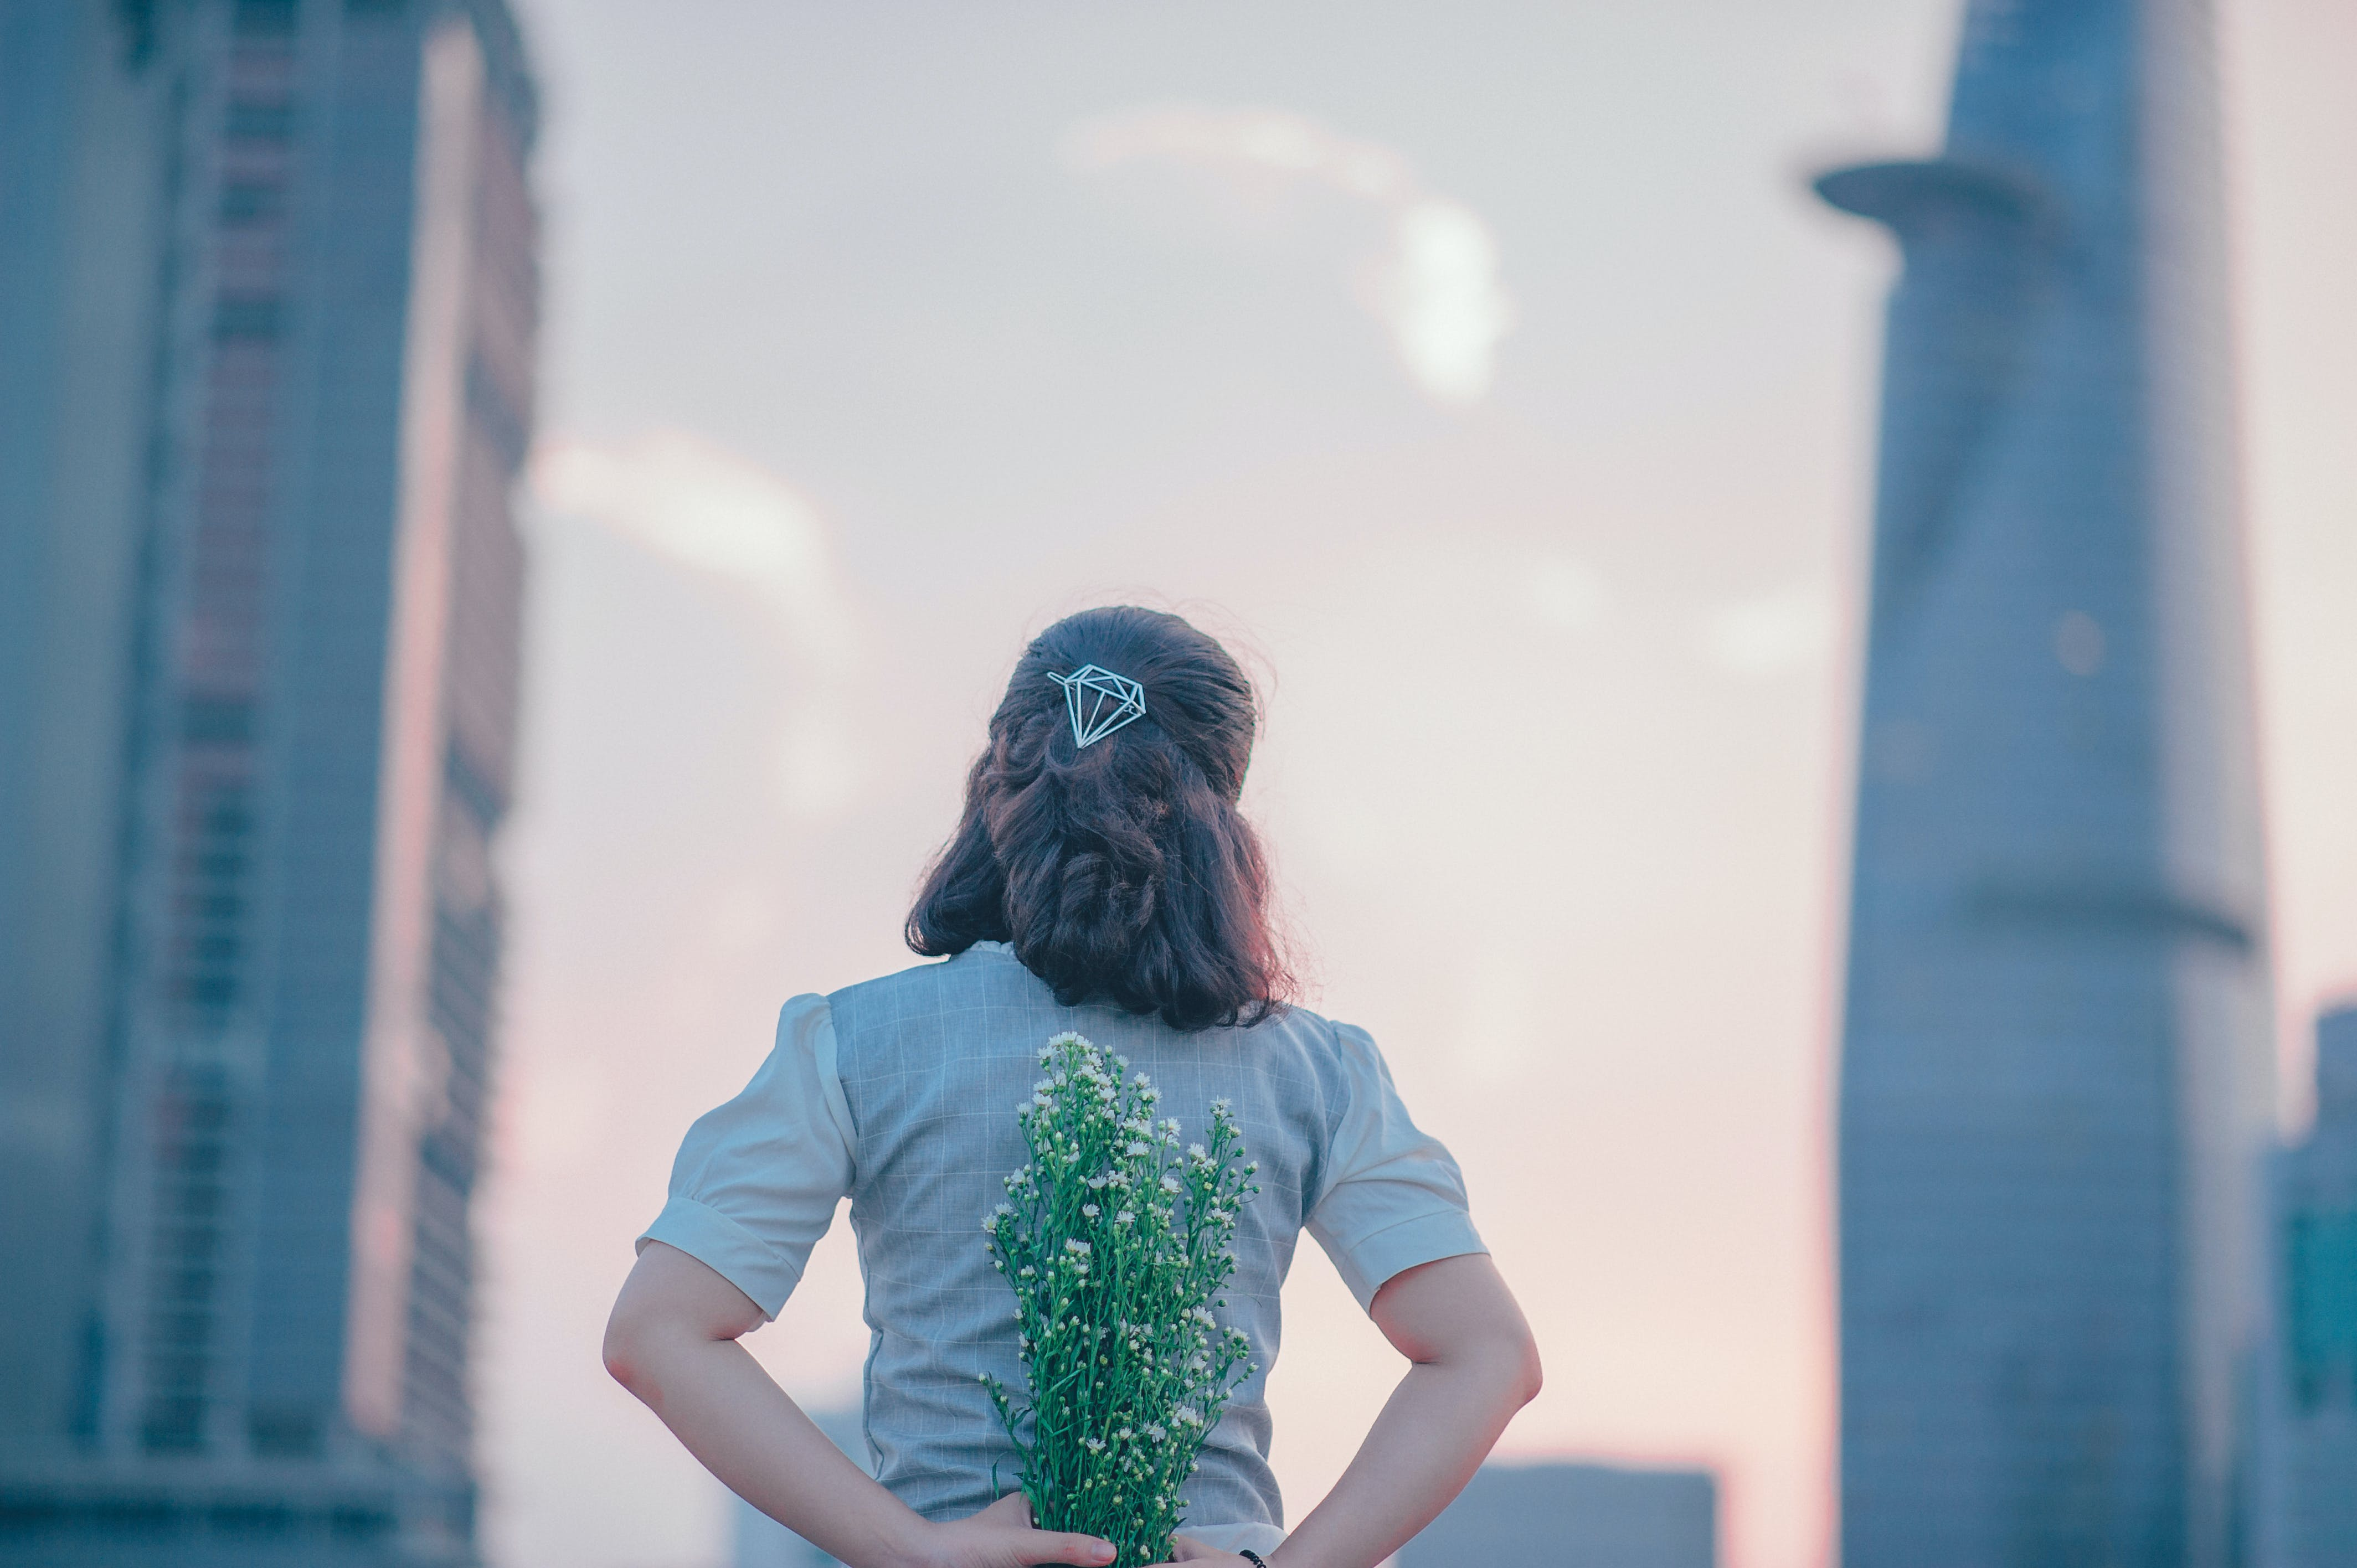 Kostnadsfri bild av blommor, Bukett, byggnader, dagsljus